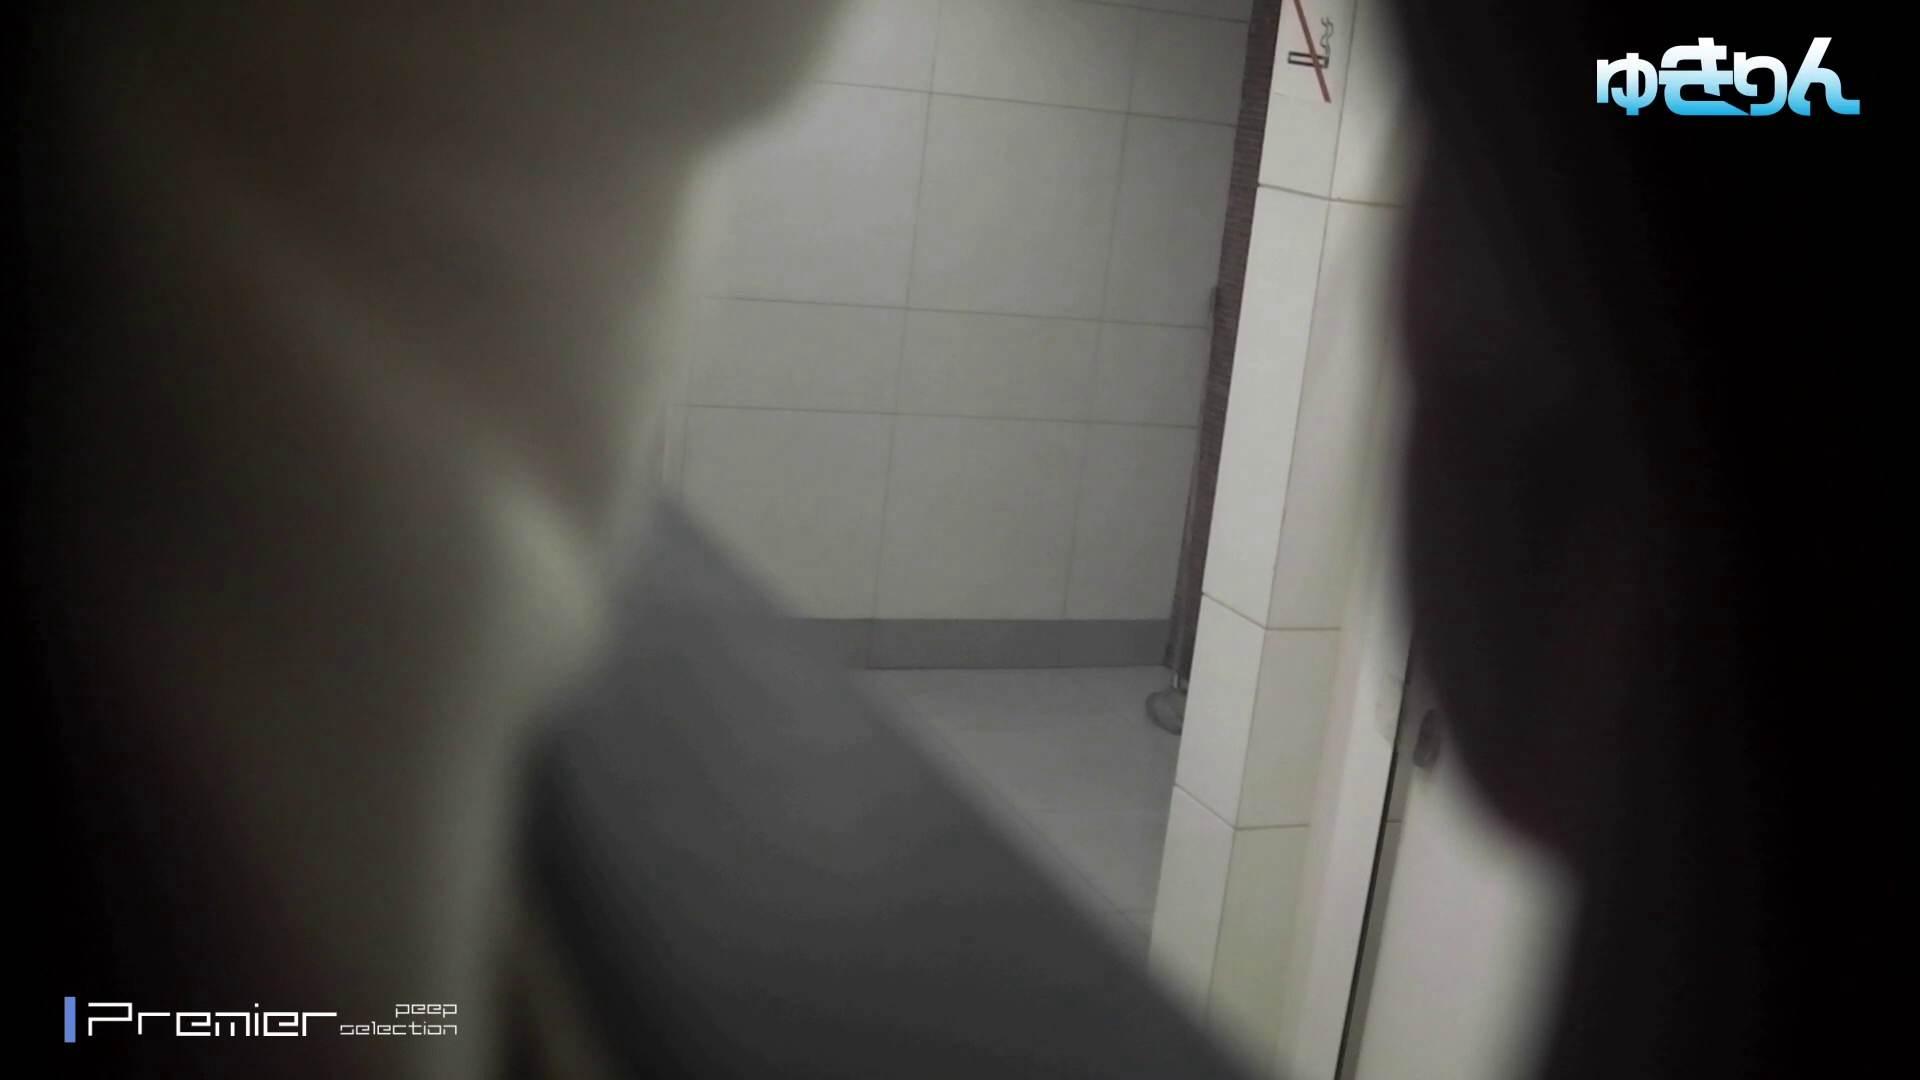 cm友達同士三人グループの二人を同時に捕獲【新世界の射窓からNo120】 エロいグループ スケベ動画紹介 80枚 21